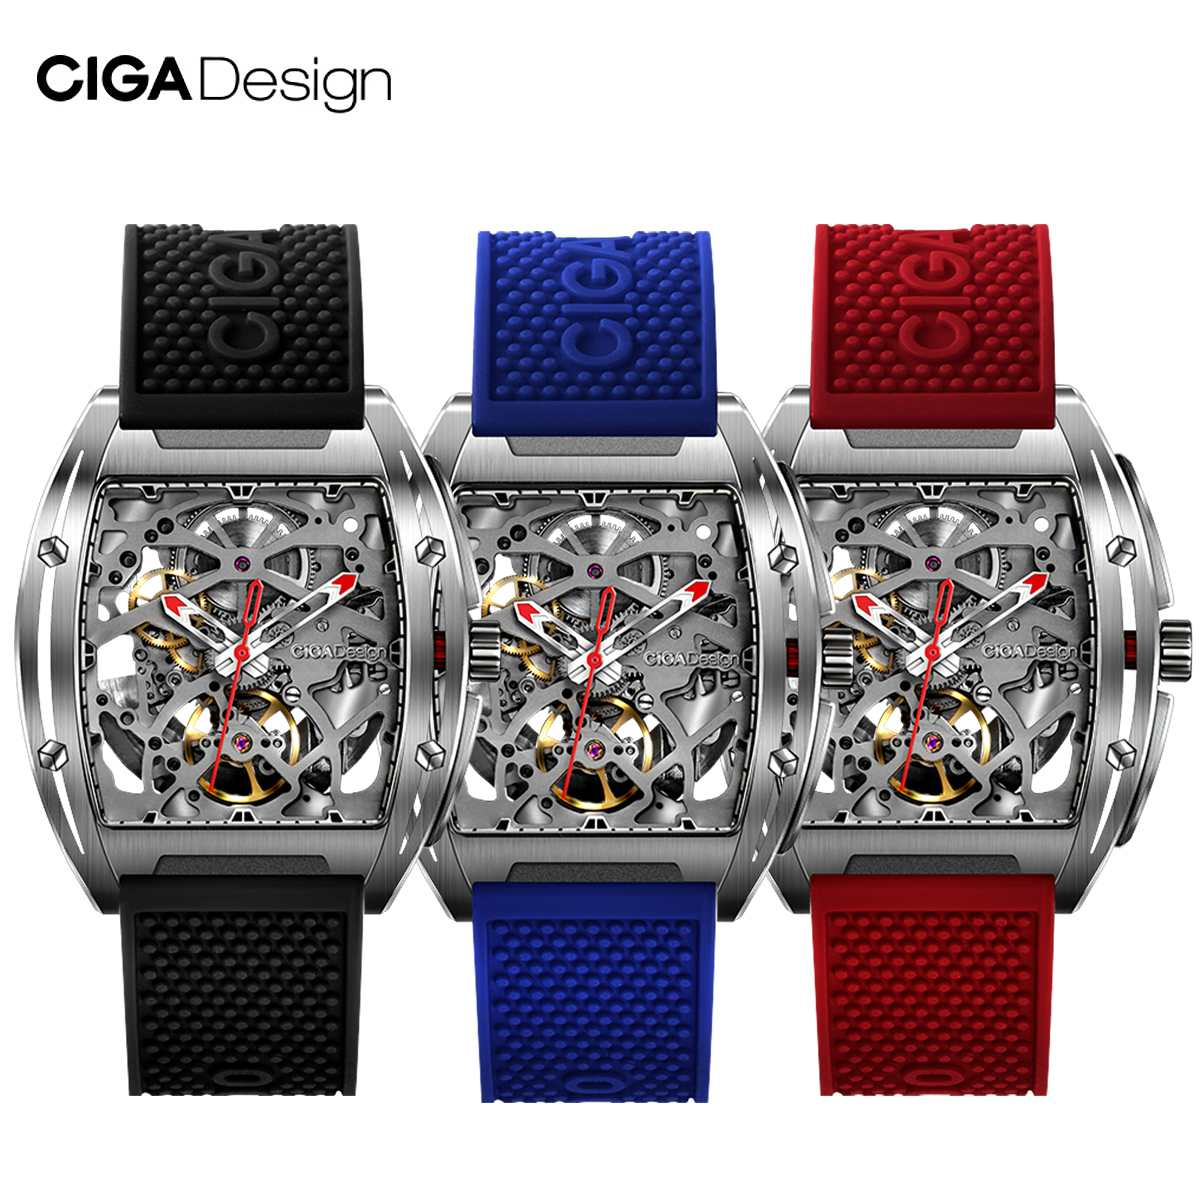 Reloj CIGA de diseño CIGA reloj Serie Z reloj en forma de barril de doble cara hueco automático esqueleto mecánico reloj impermeable para hombre 20m 22mm de goma de Nylon de reloj de silicona banda reloj Omega Correa Seamaster Planet Ocean 8900 9900 naranja negro azul pulseras